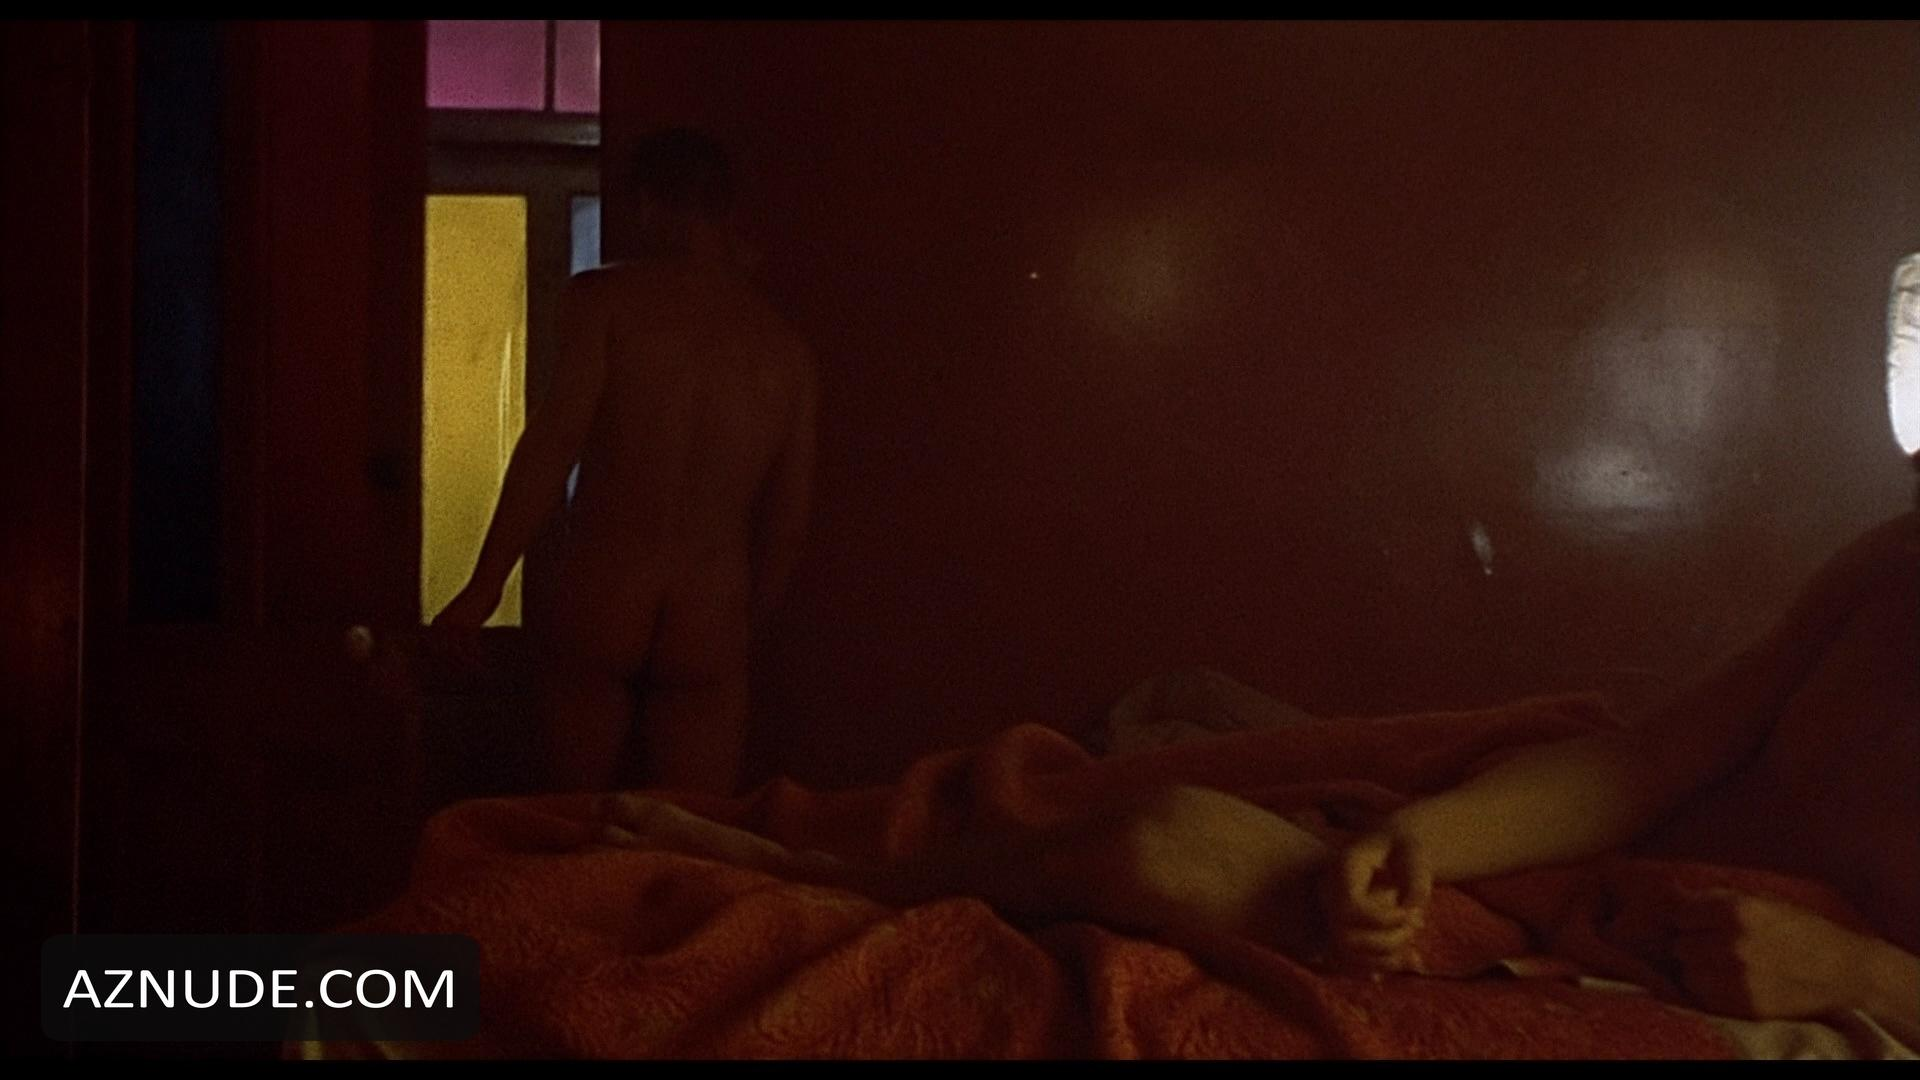 Colin Farrell Reveals His Most Embarrassing Sex Scene Ever